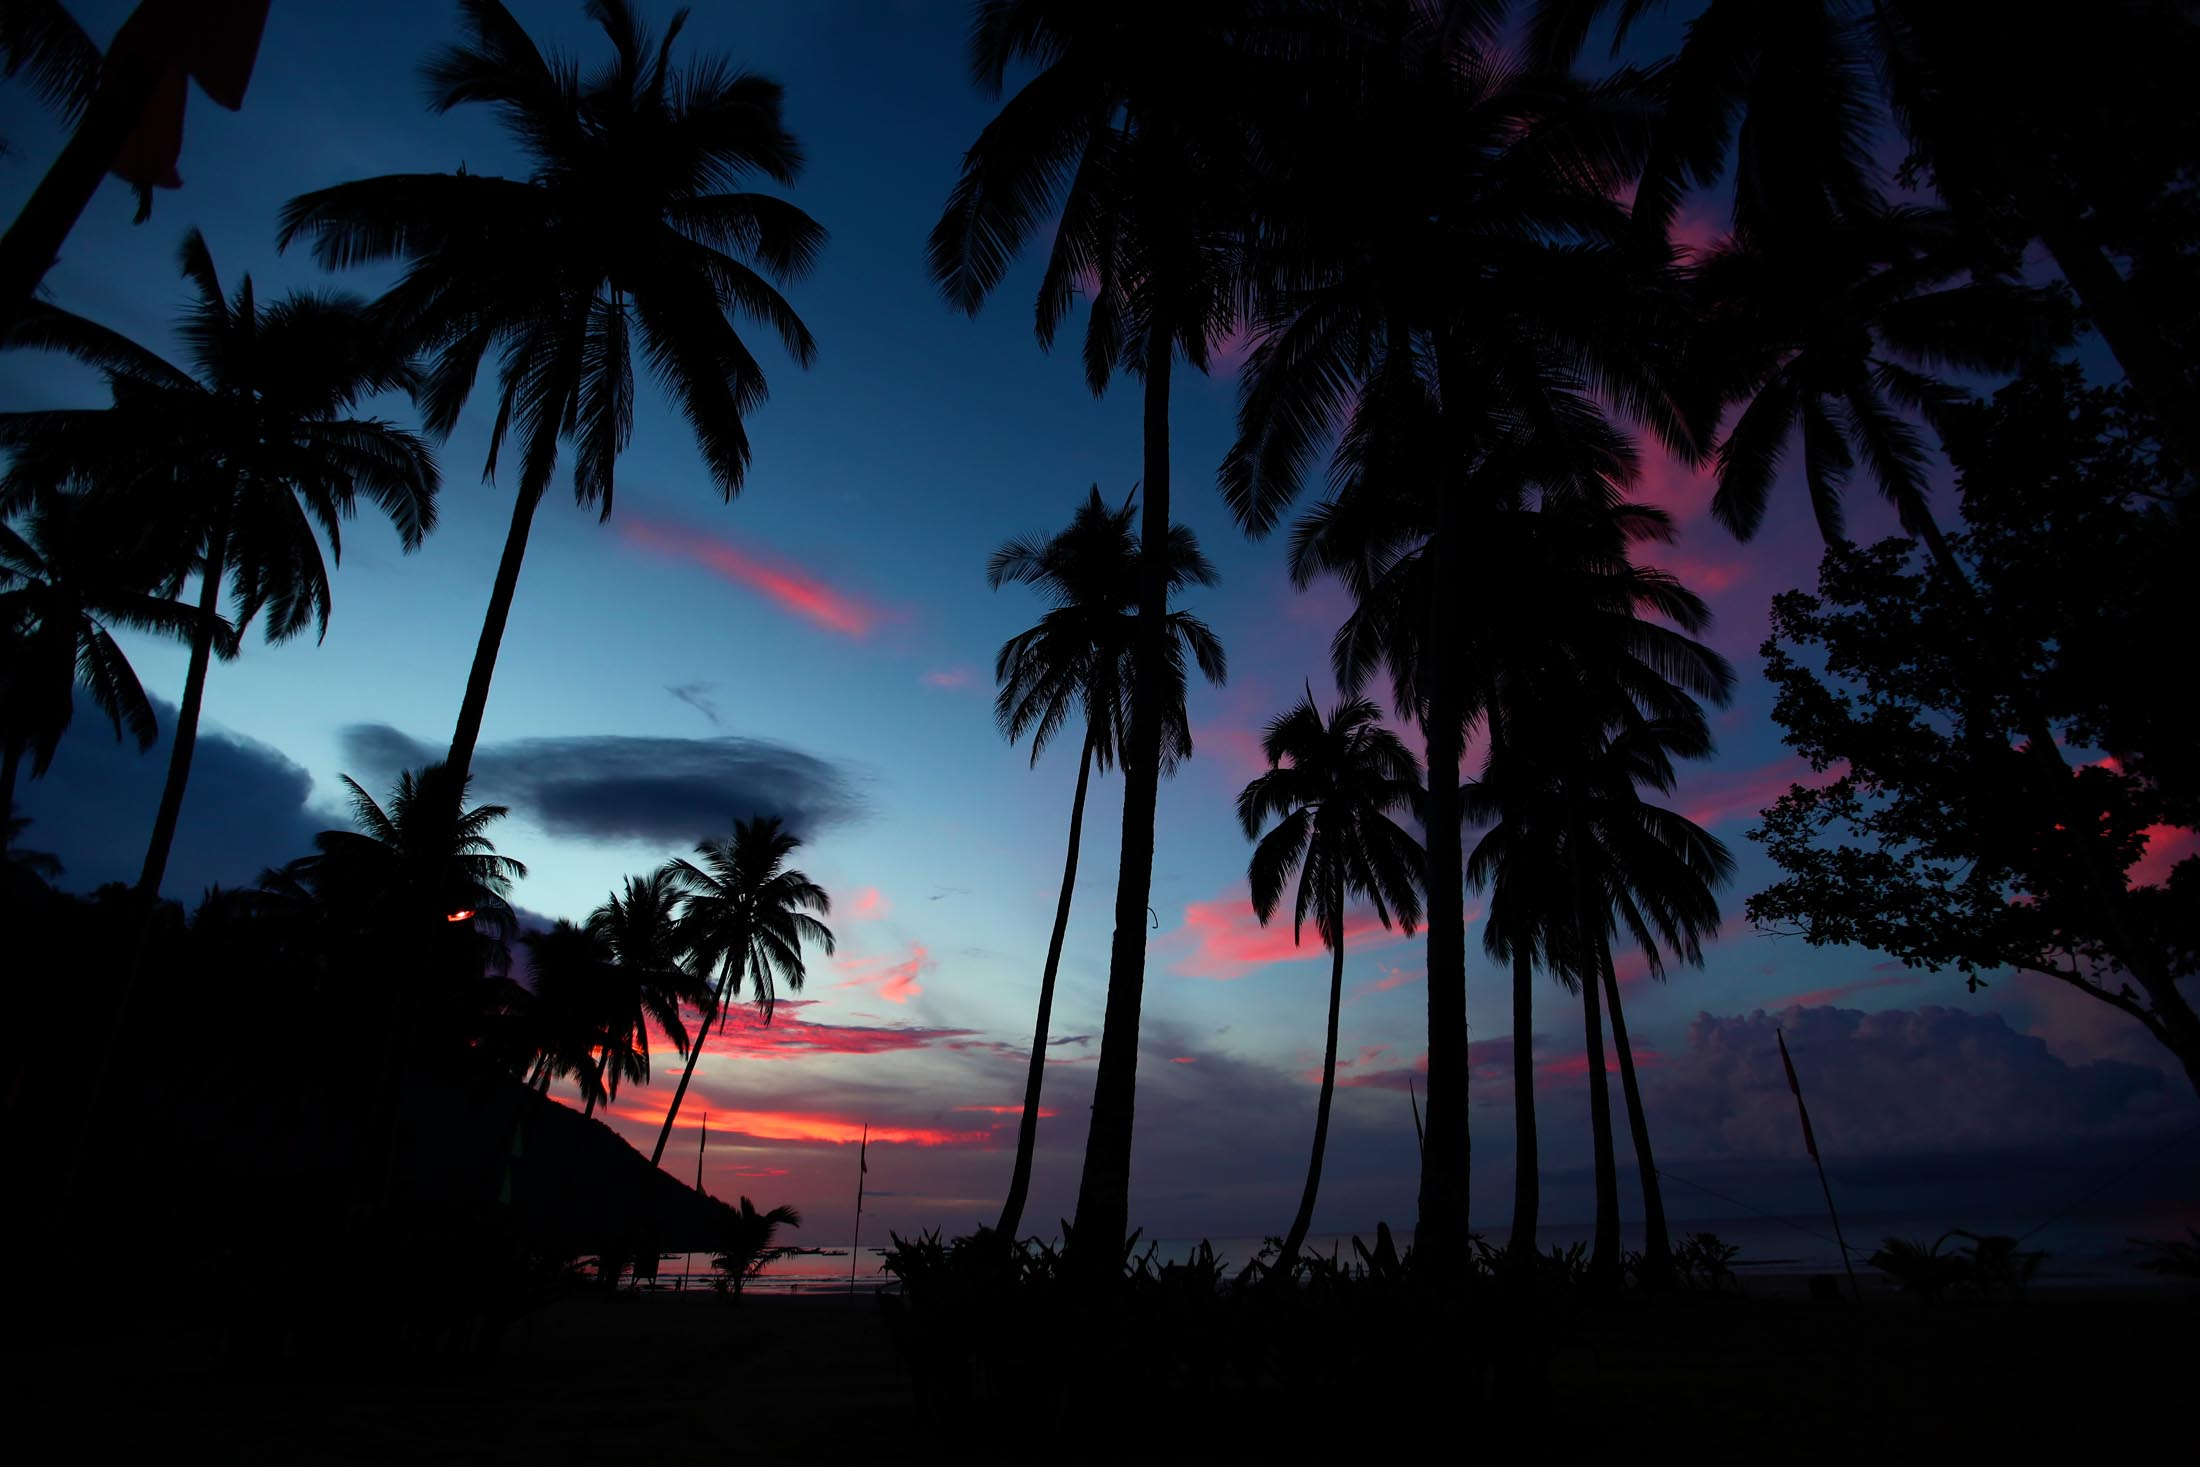 Sunset on Palawan, Philippines